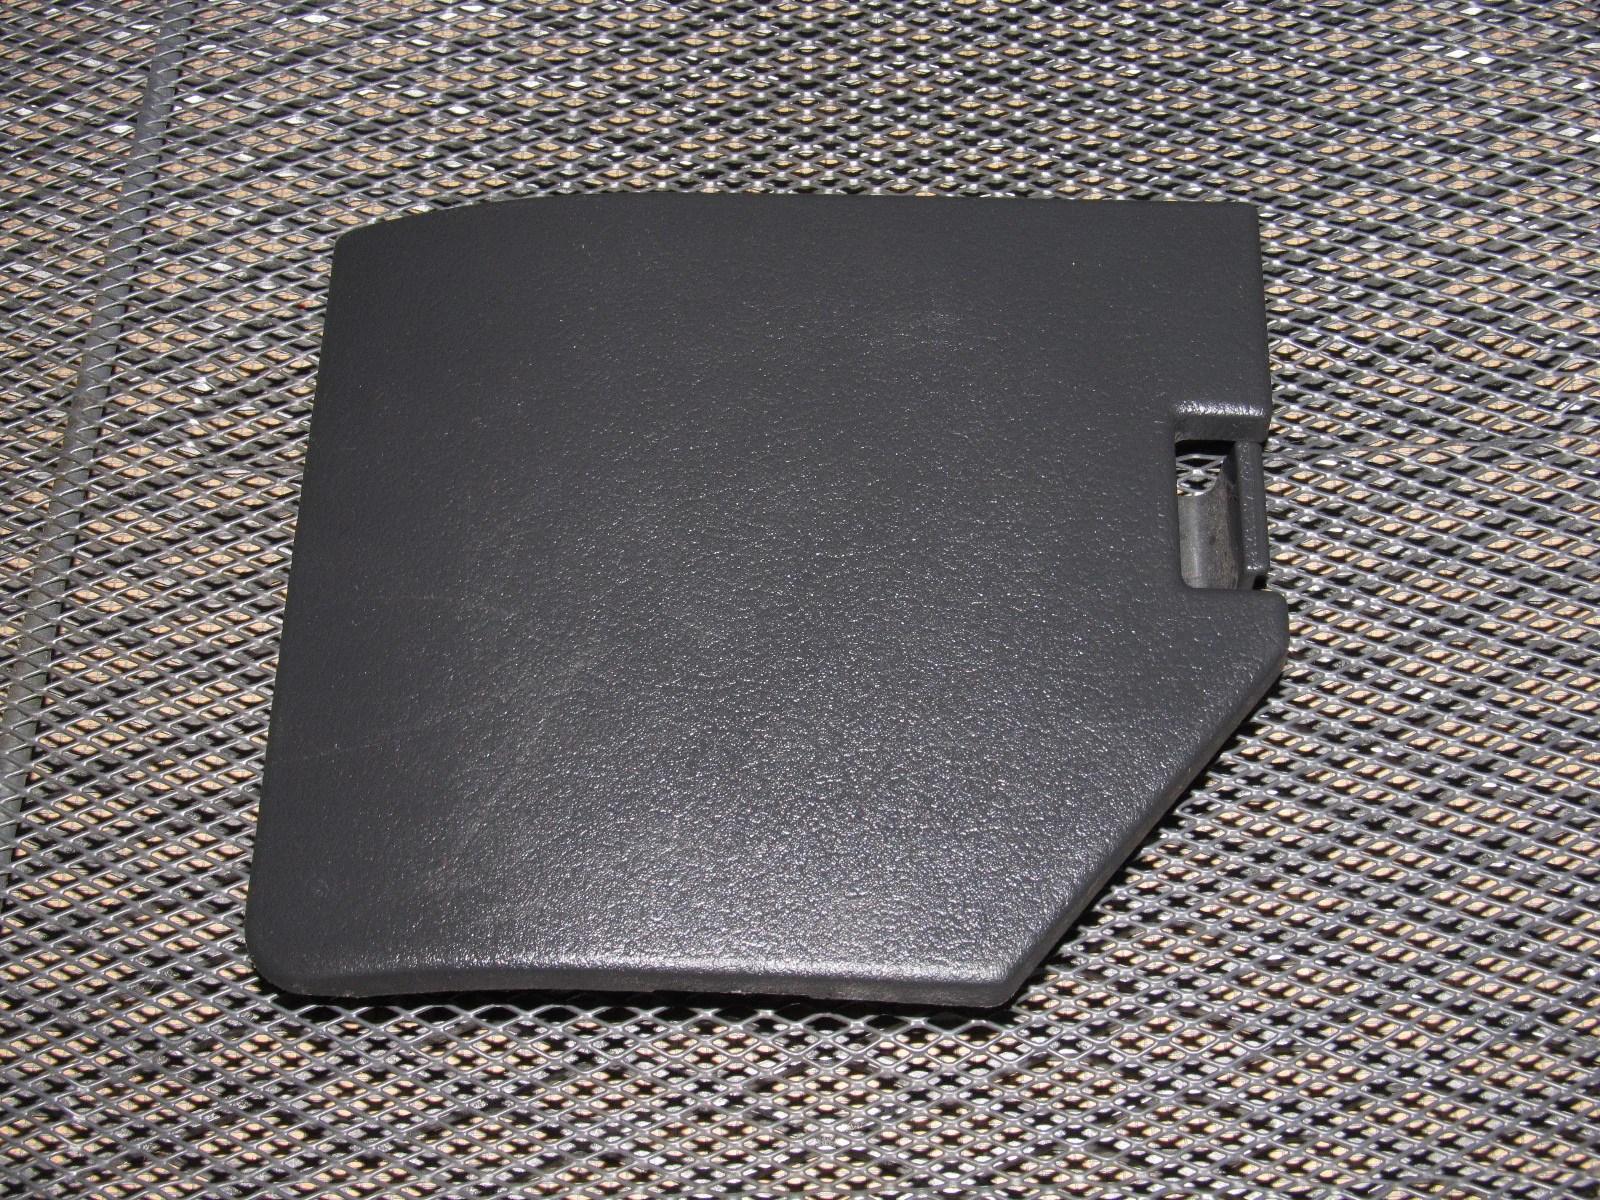 91 92 93 94 nissan 240sx oem interior fuse box cover 4runner fuse box 78 280z [ 1600 x 1200 Pixel ]